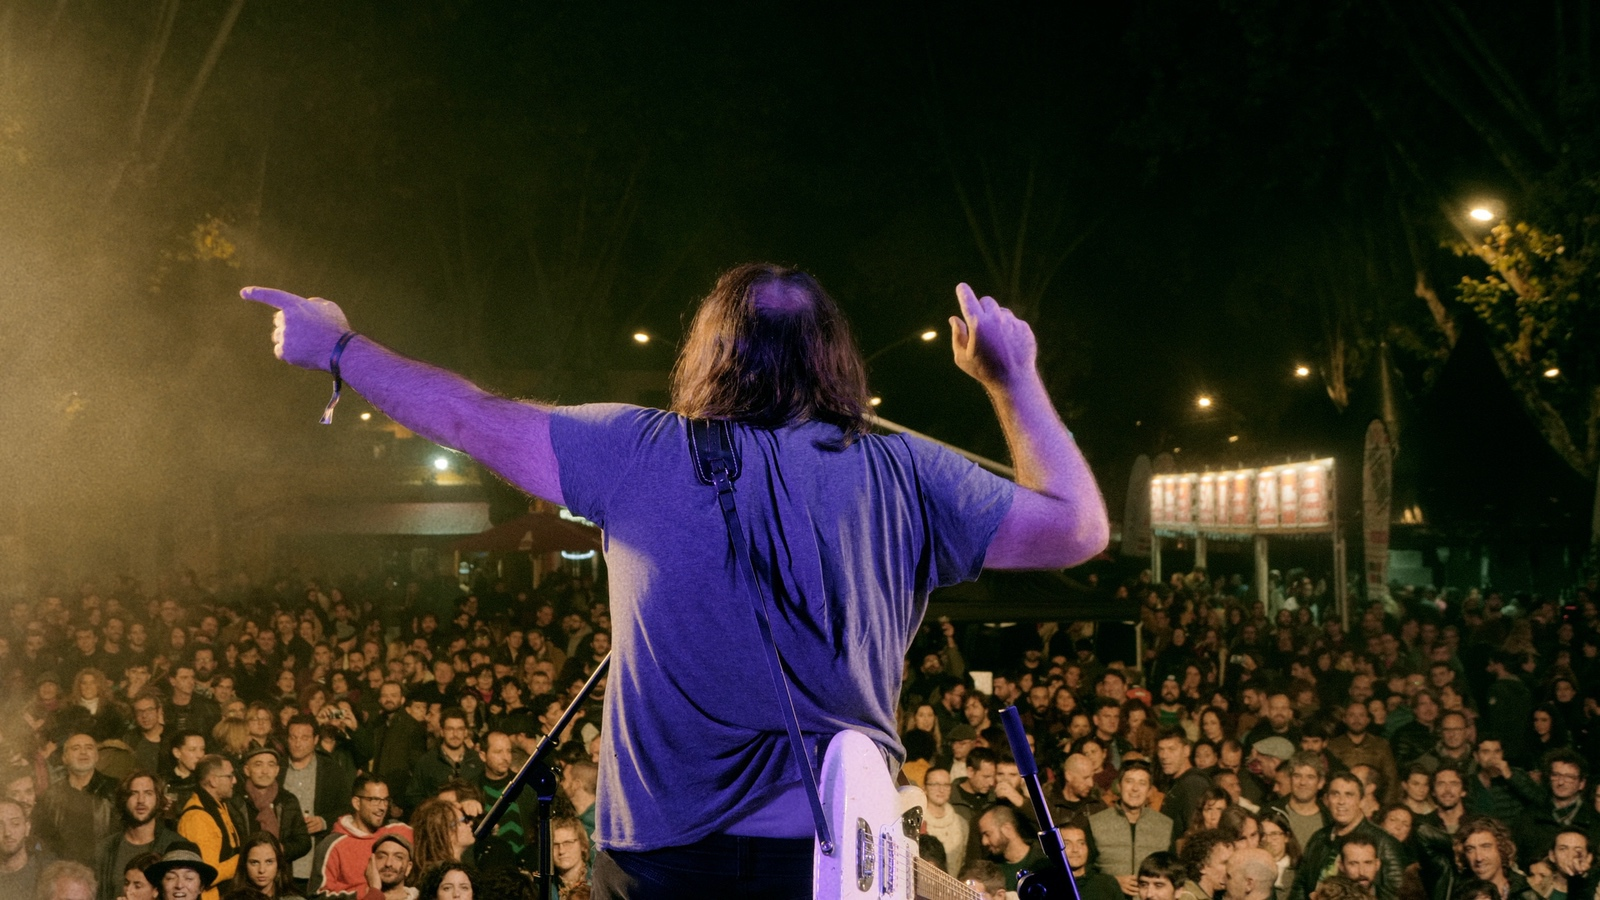 Paco Loco: viva el noise